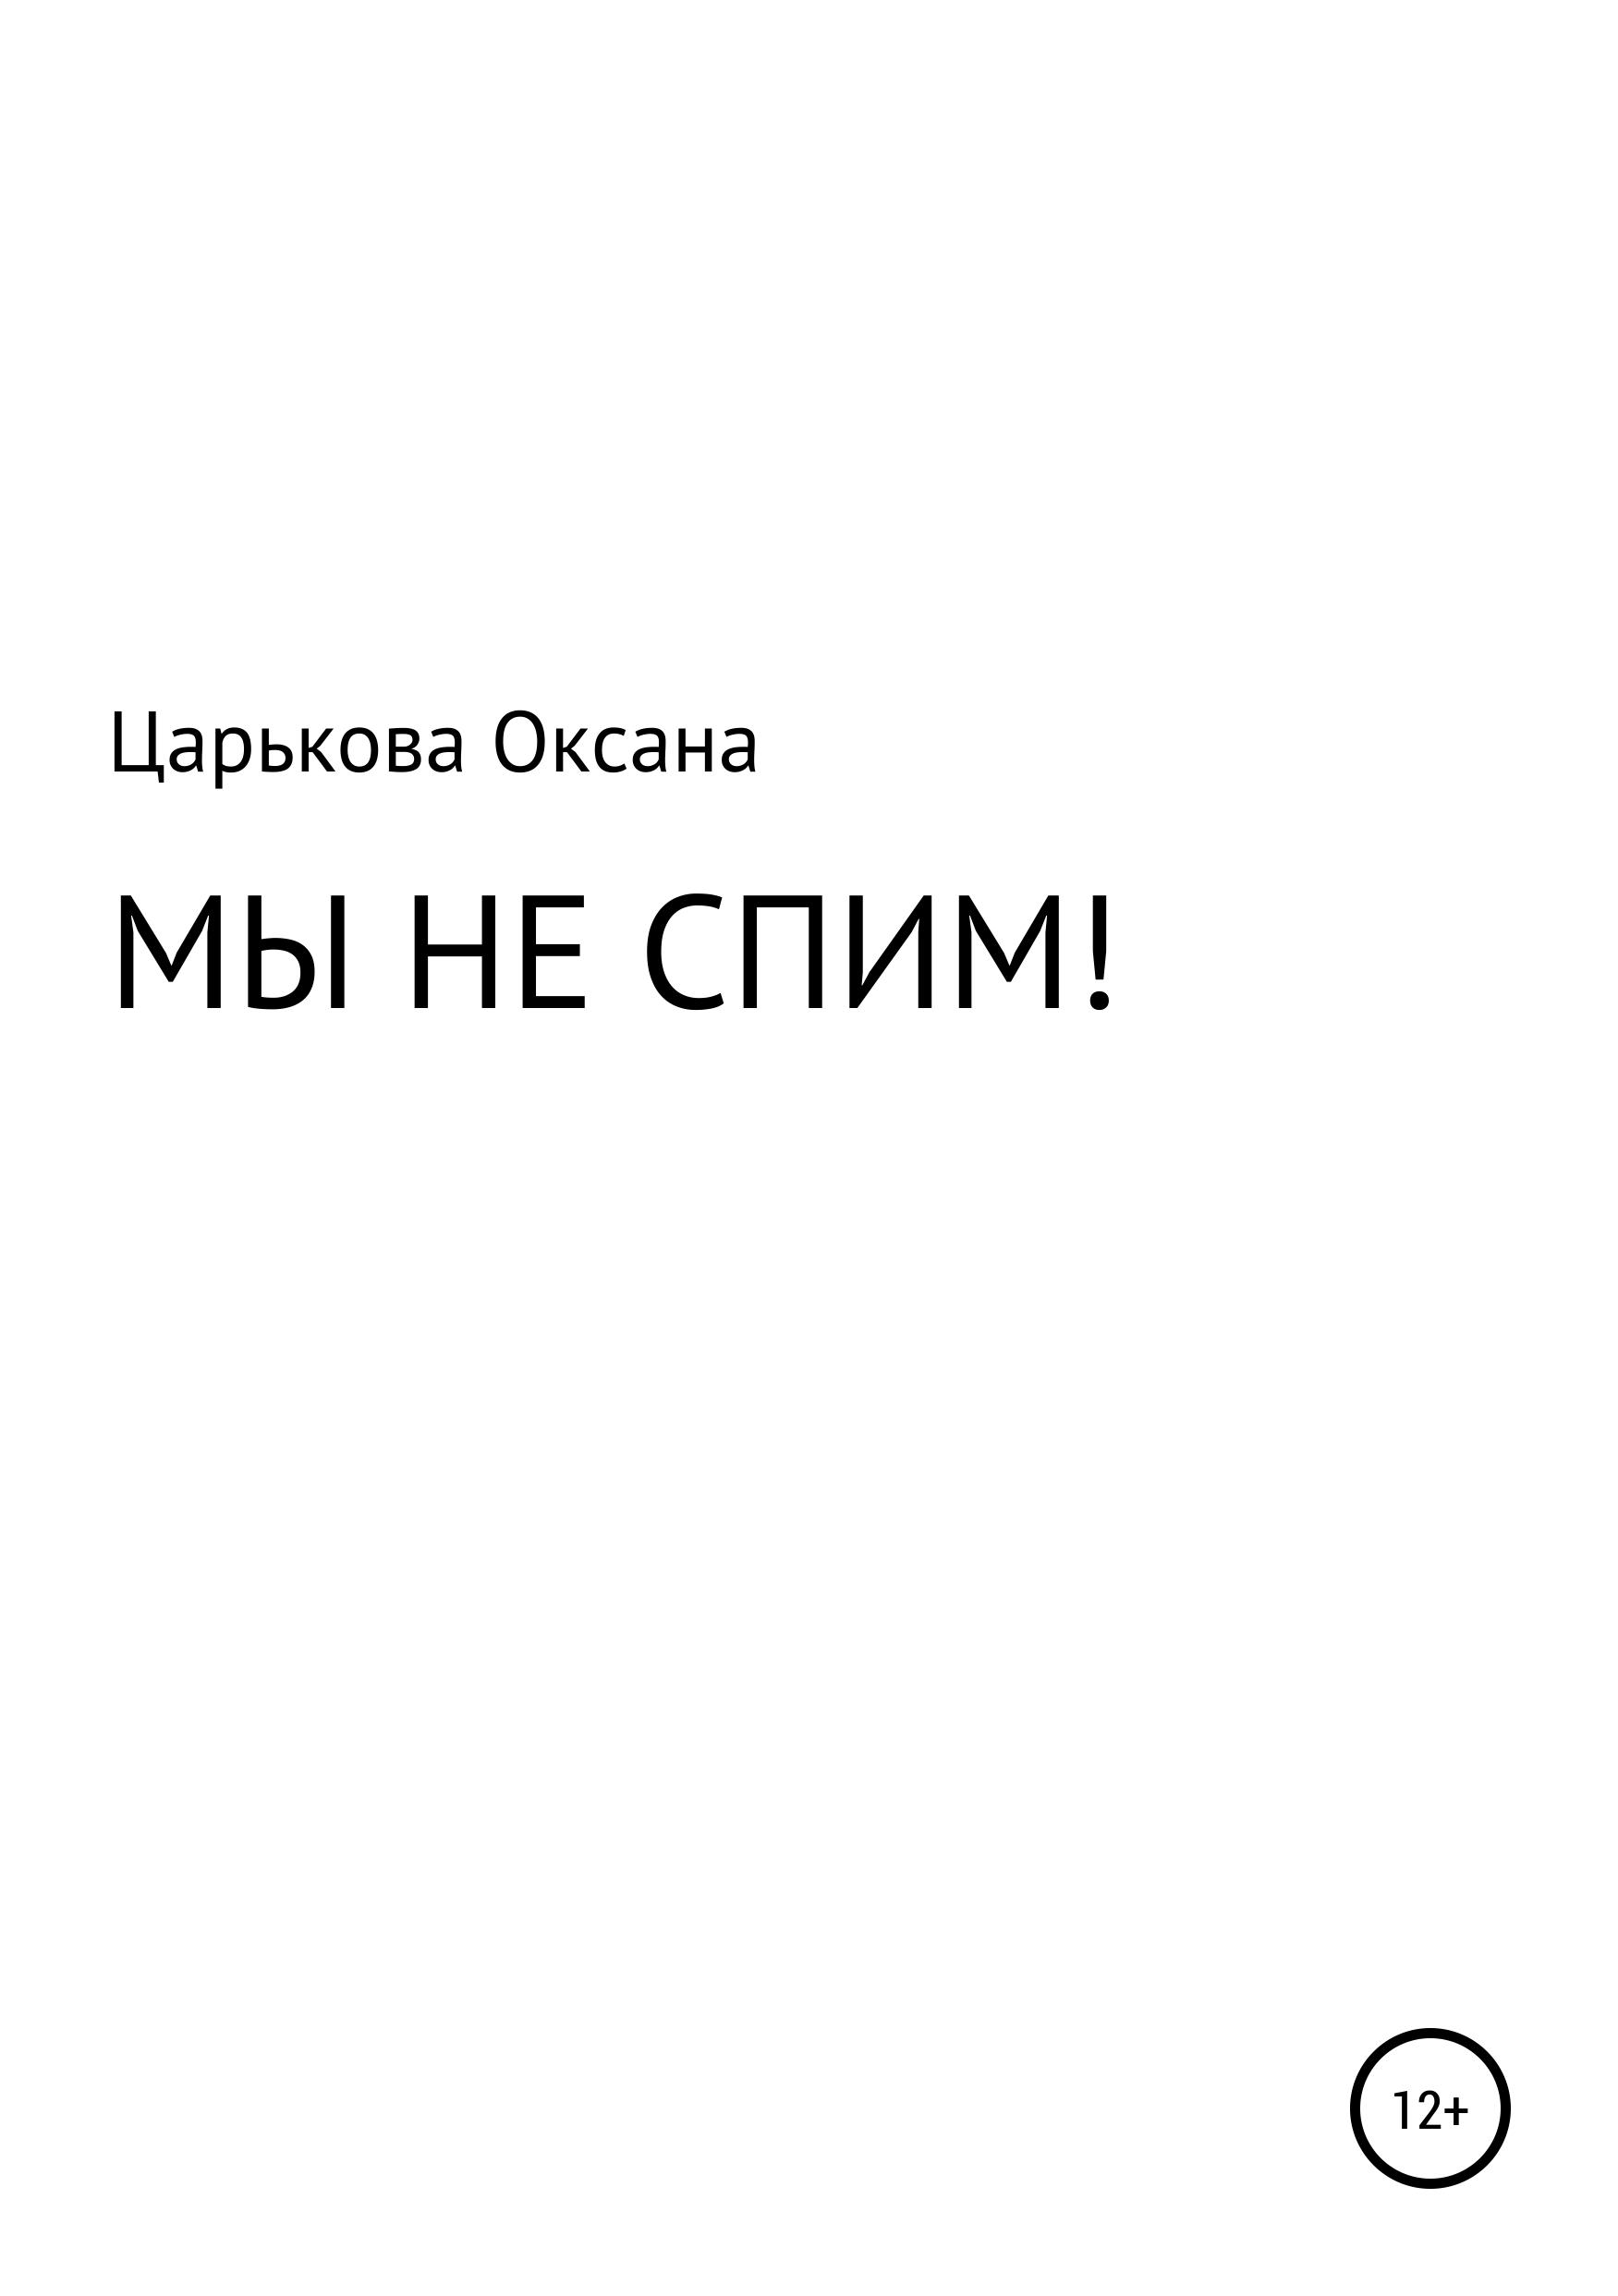 Оксана Сергеевна Царькова МЫ НЕ СПИМ!